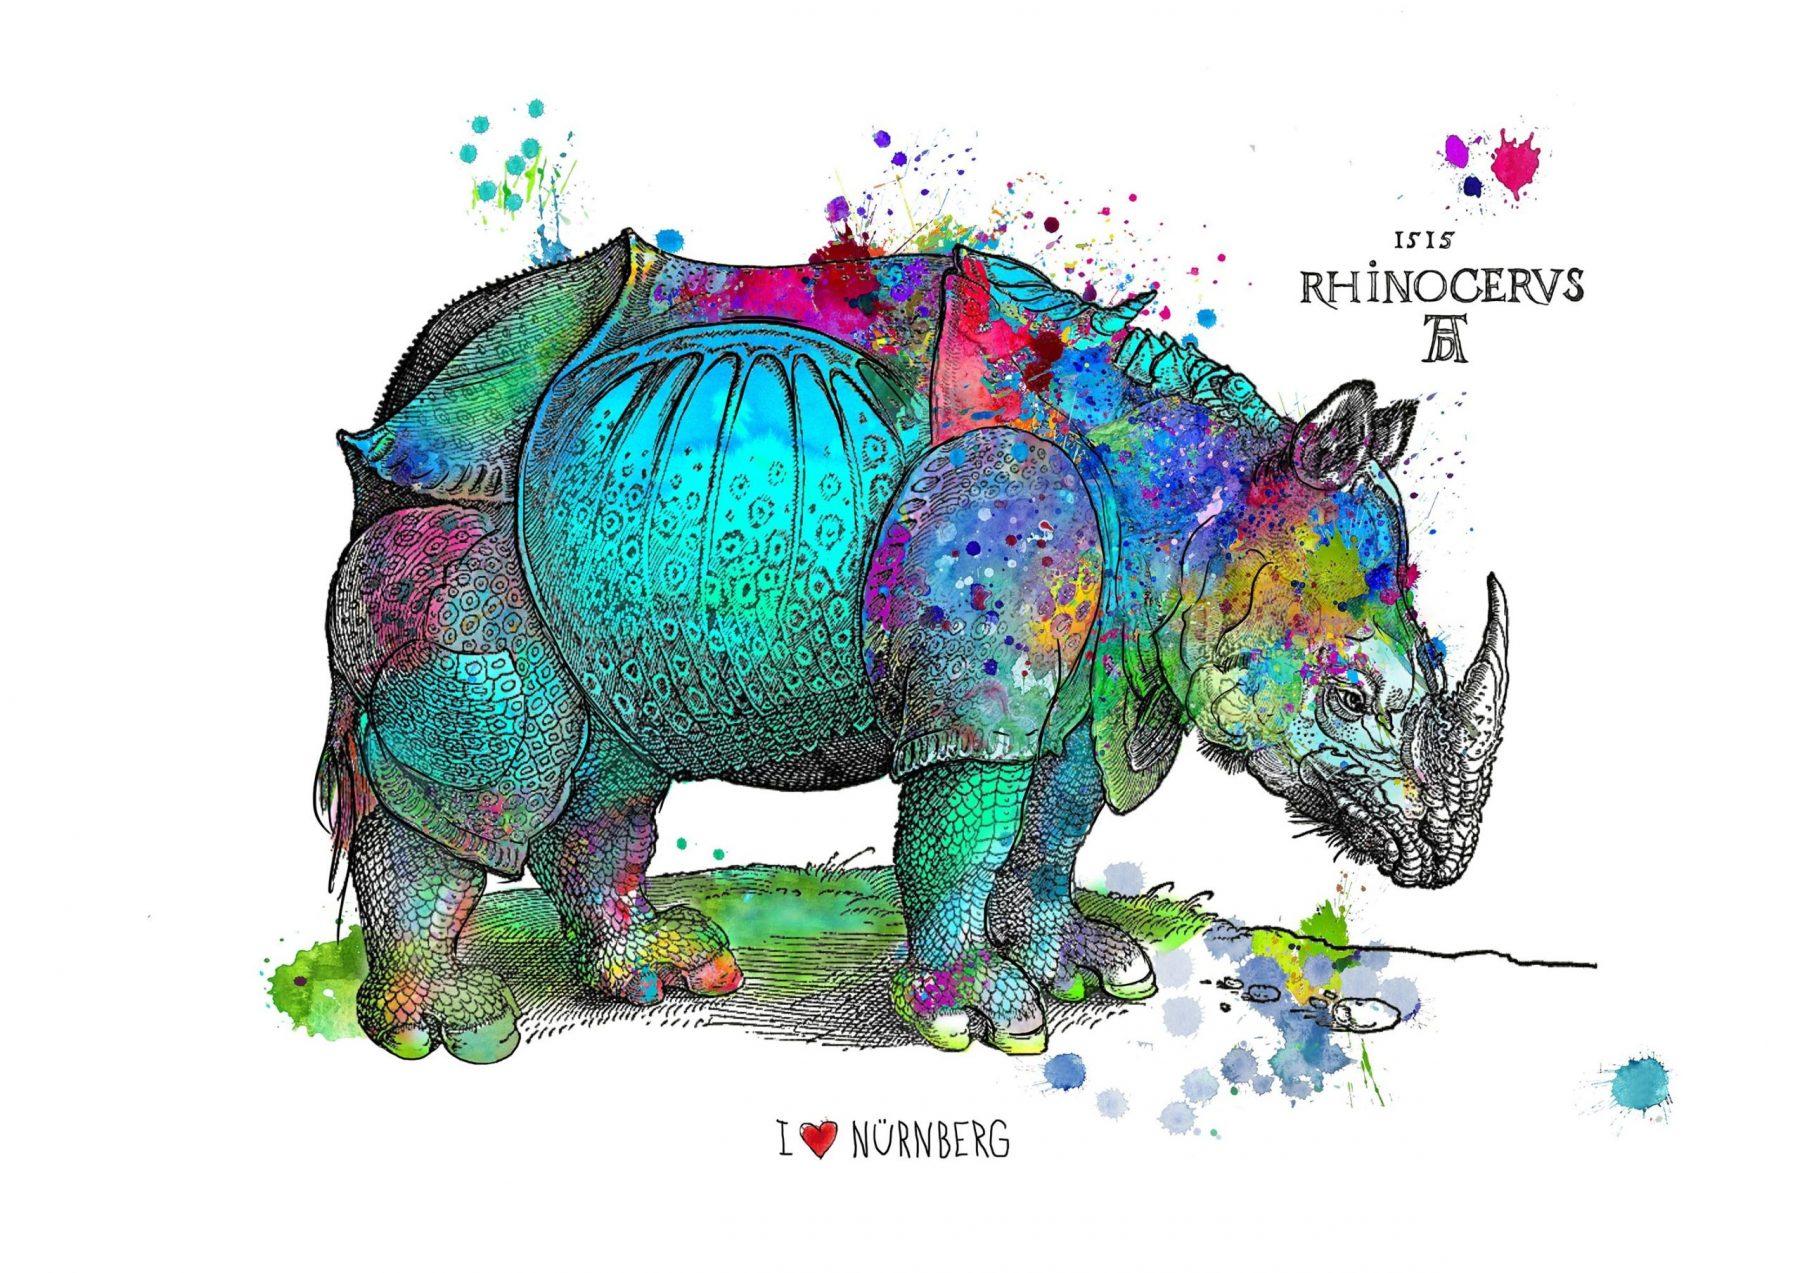 Happy Rhino, türkis - Osten, Birgit - k-BO39